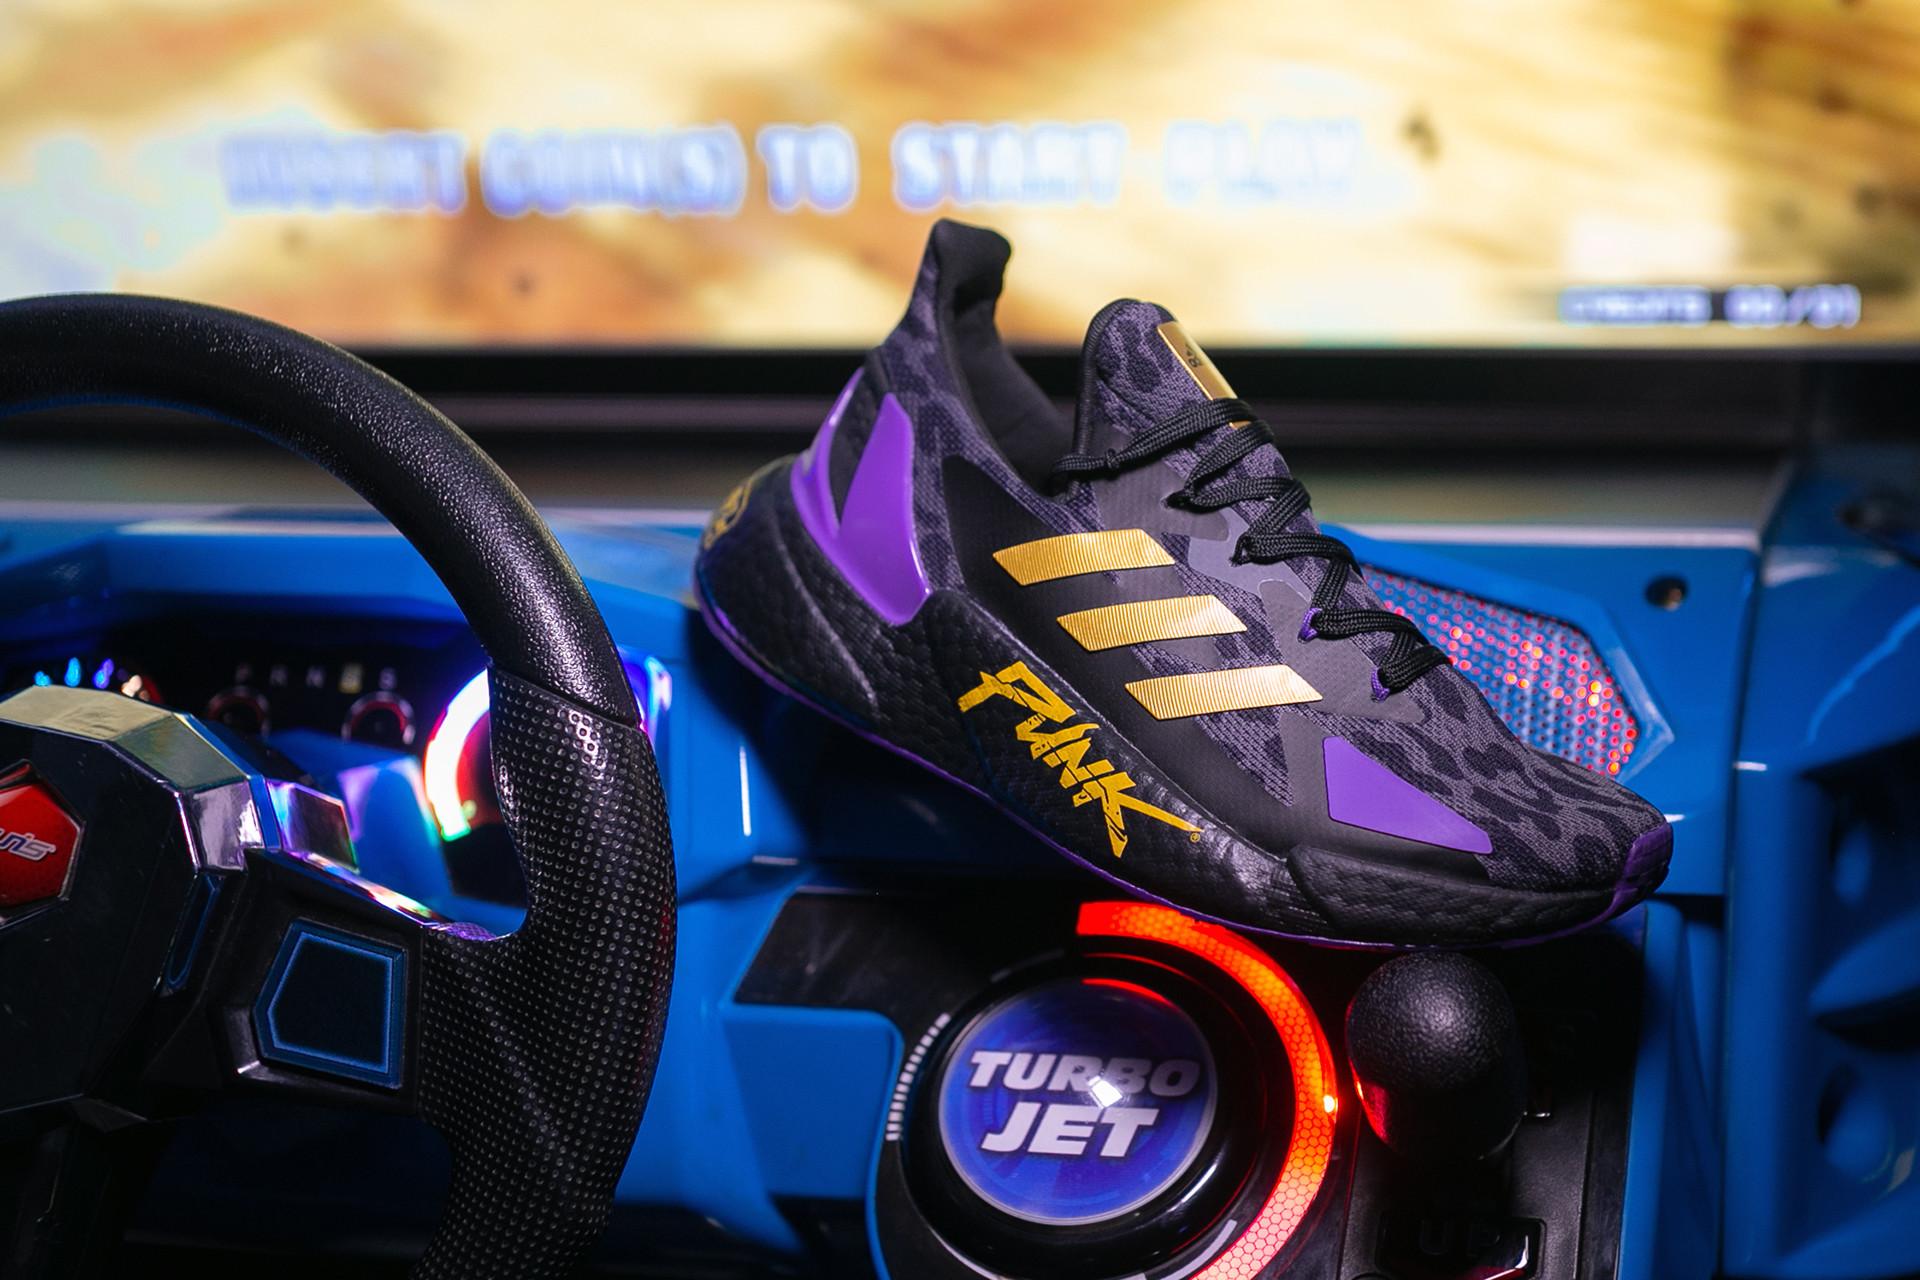 Кроссовки Adidas X9000L4 «CYBERPUNK 2077»